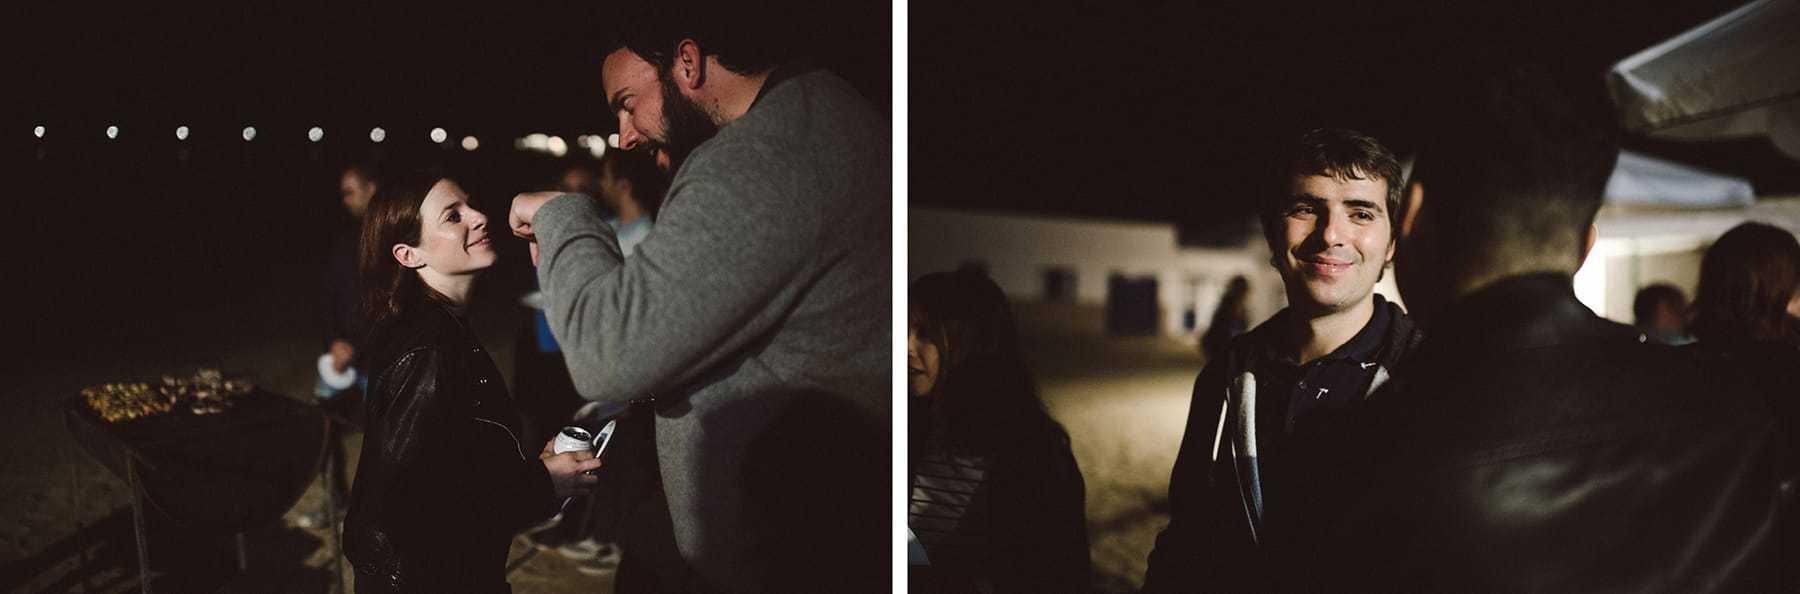 wolves_workshop_hilario_sanchez_fotografo_boda_españa_517